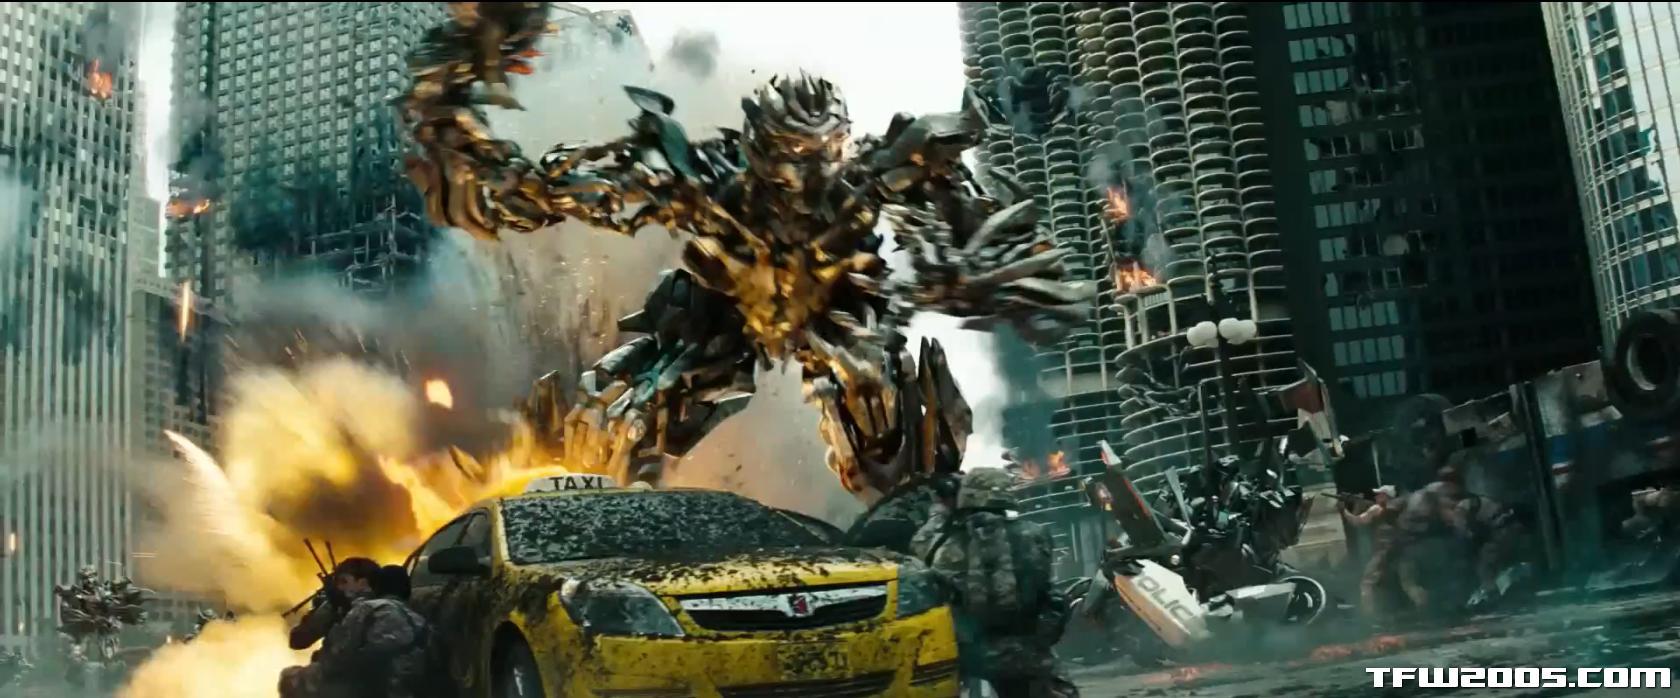 barricade movie transformers wiki fandom powered by